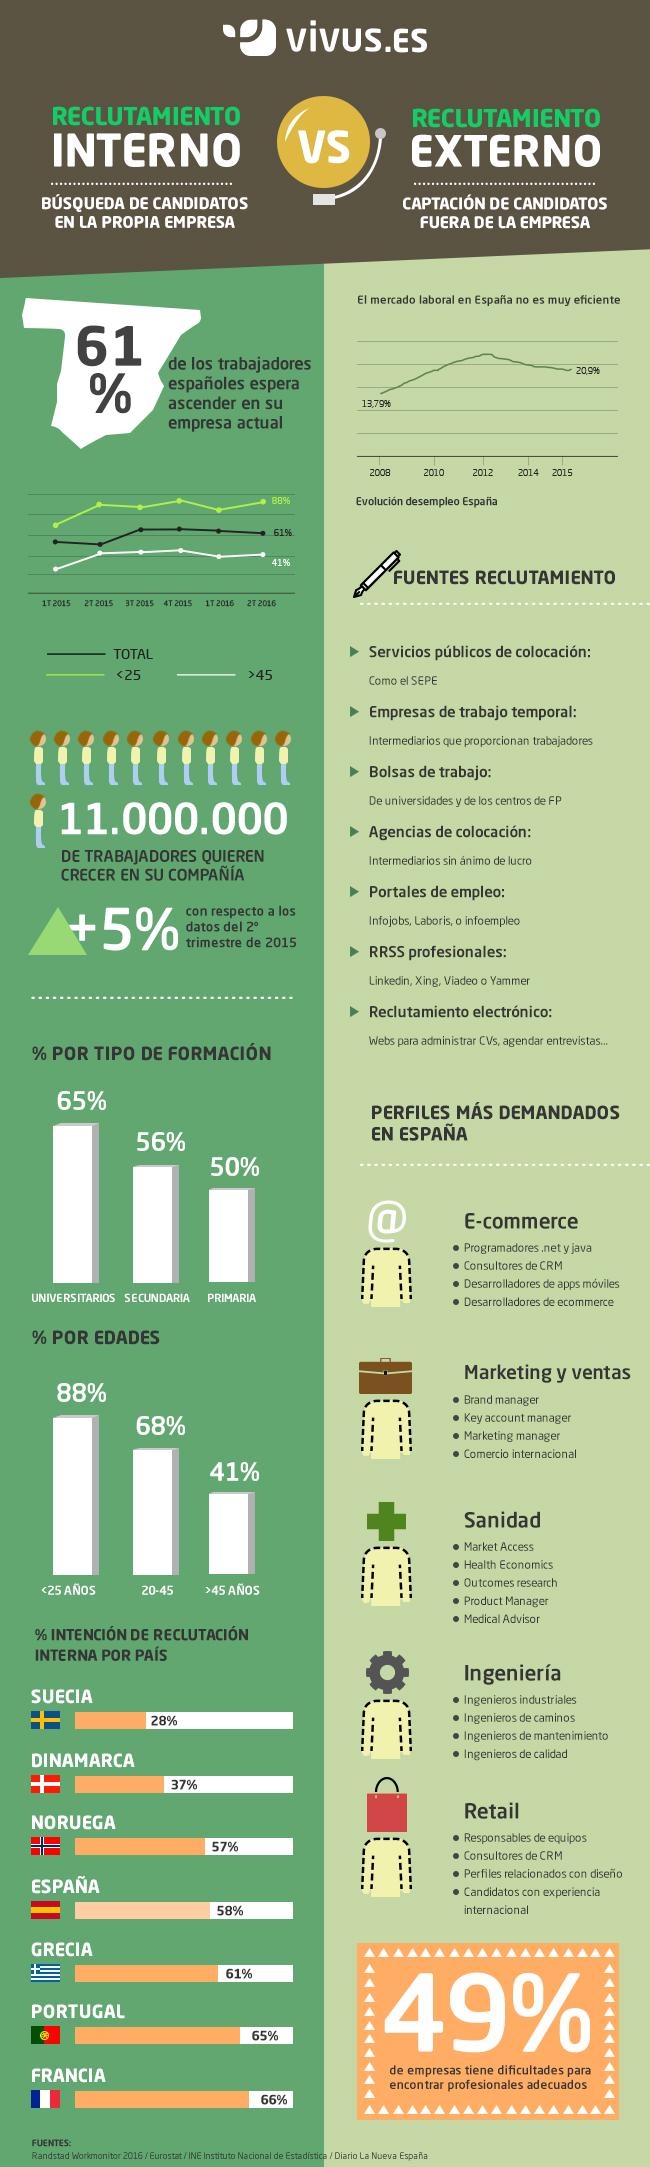 infografia reclutamiento